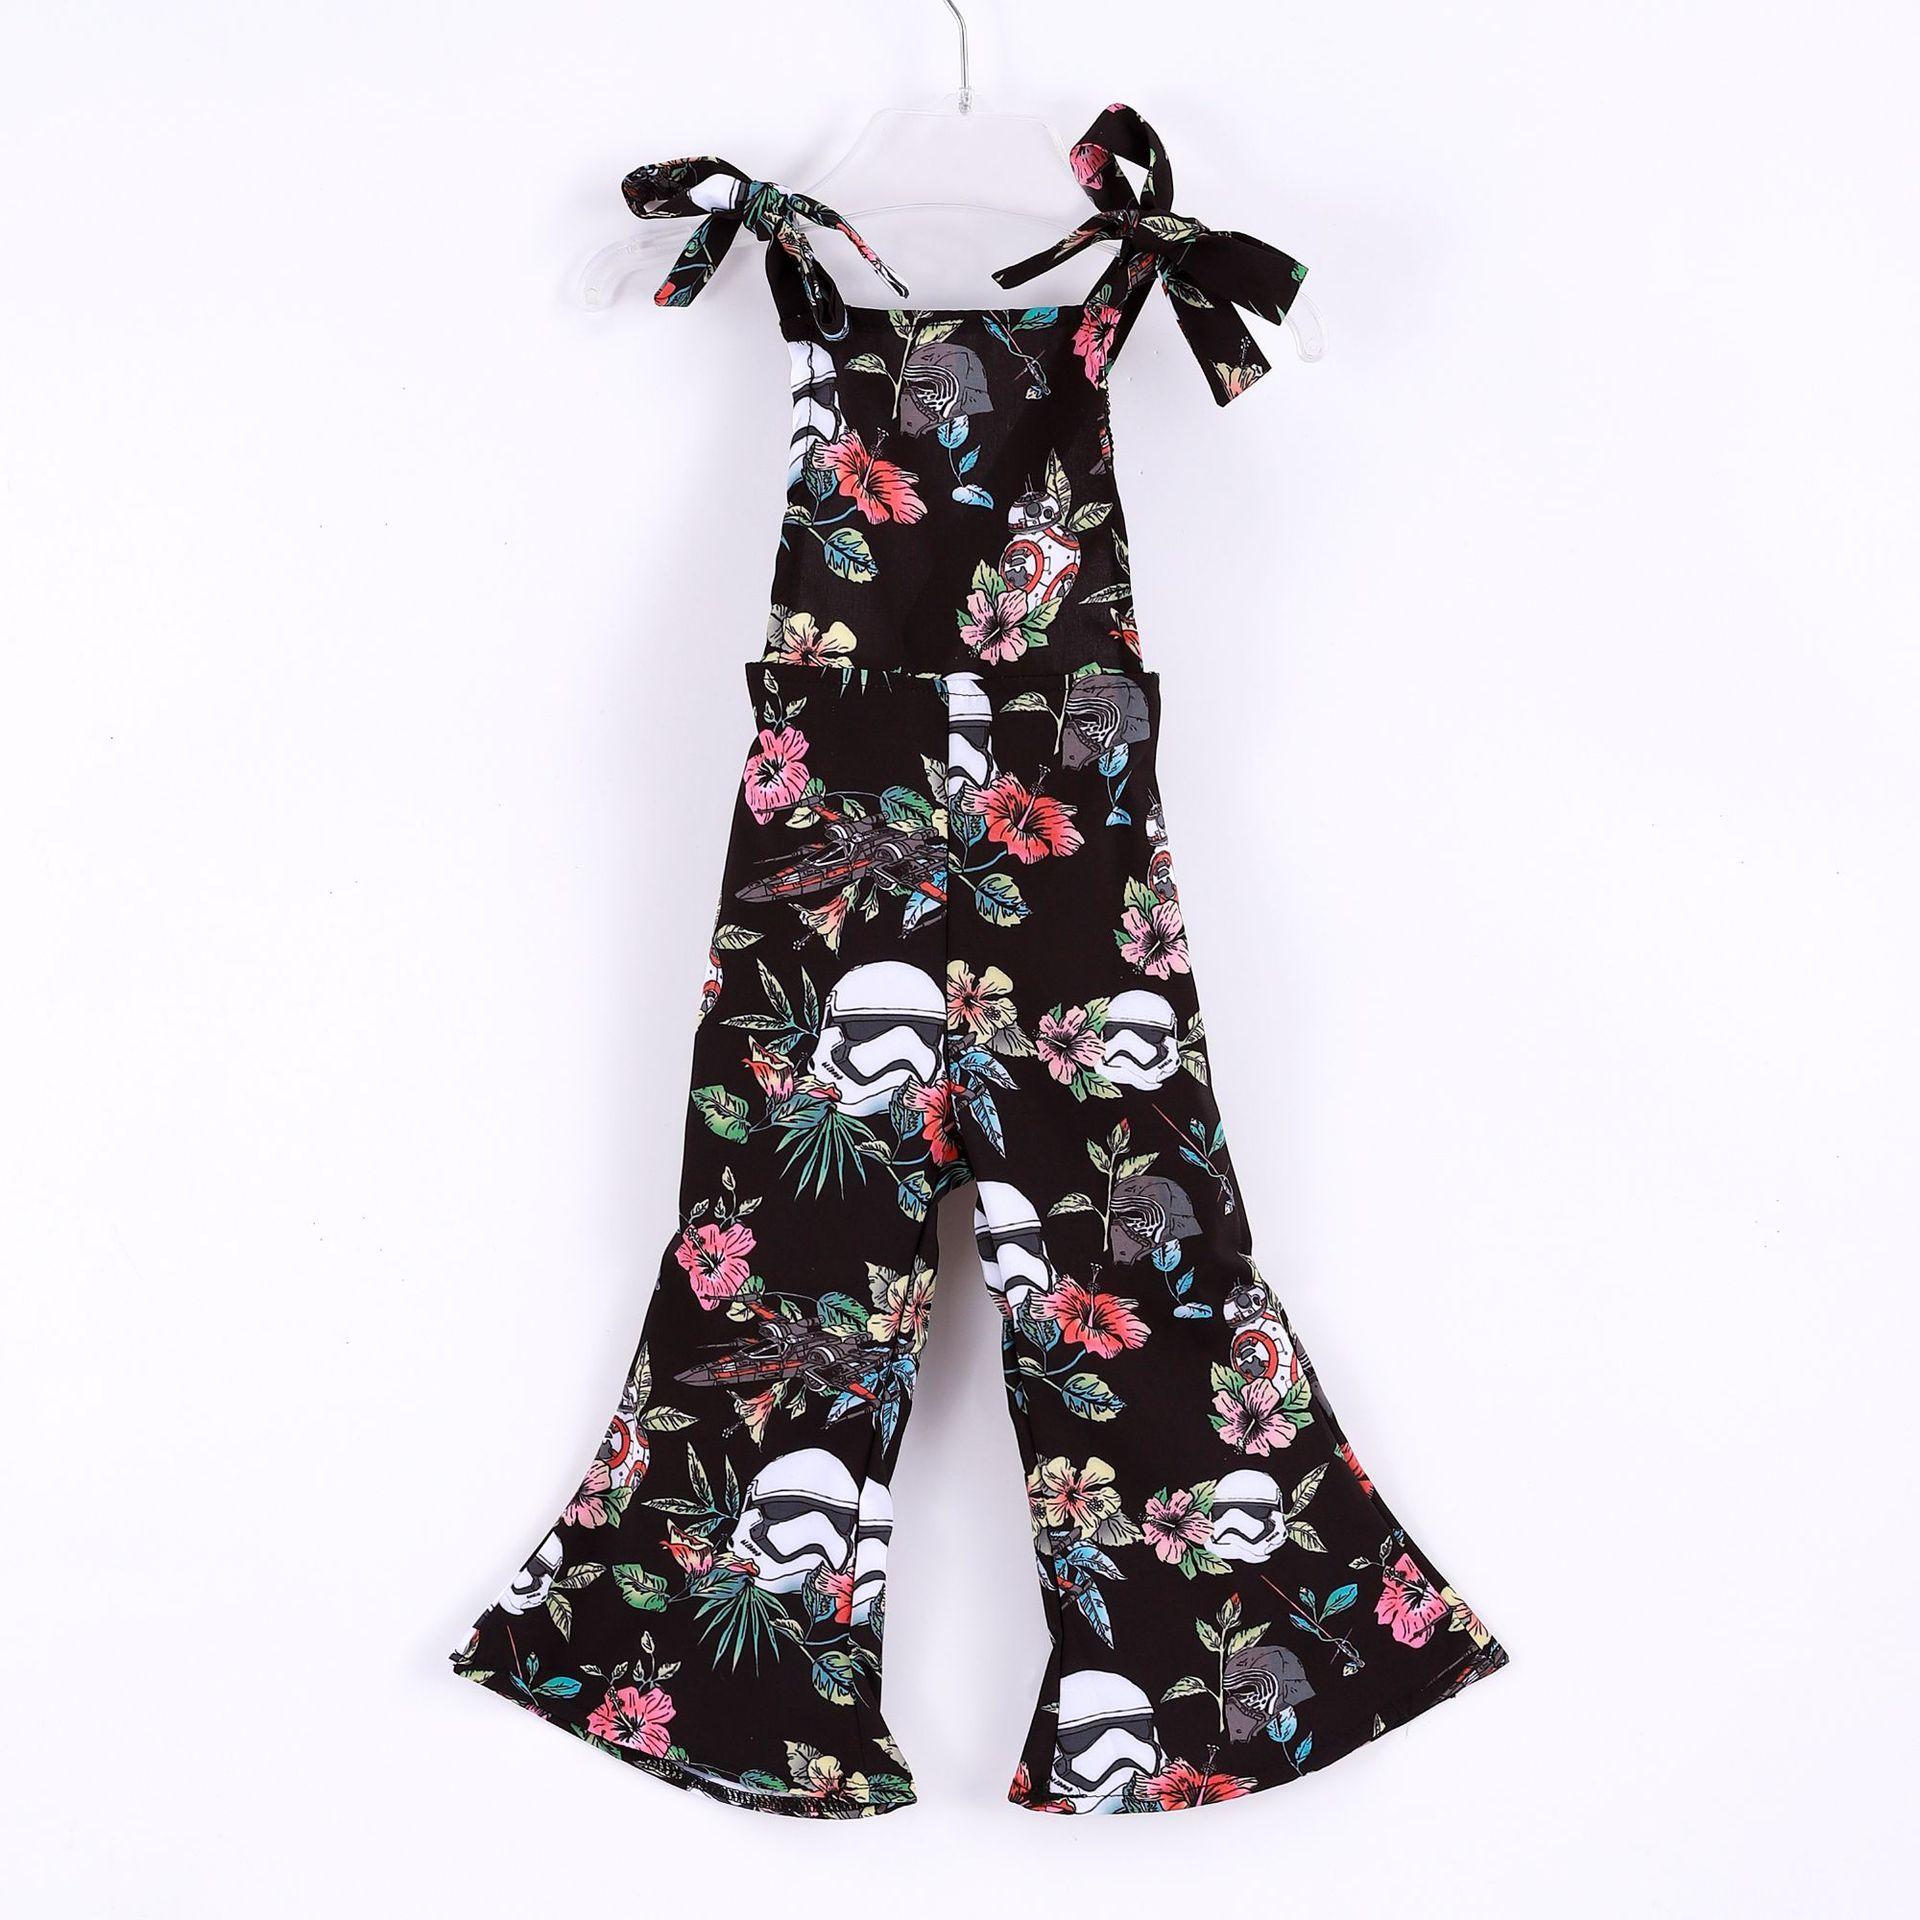 the best attitude 3ba01 09772 Tuta da ragazza INS Floral Kids Abbigliamento 2018 Summer Fashion Printed  Flower Tute Baby Girl Clothes Summer Rompers